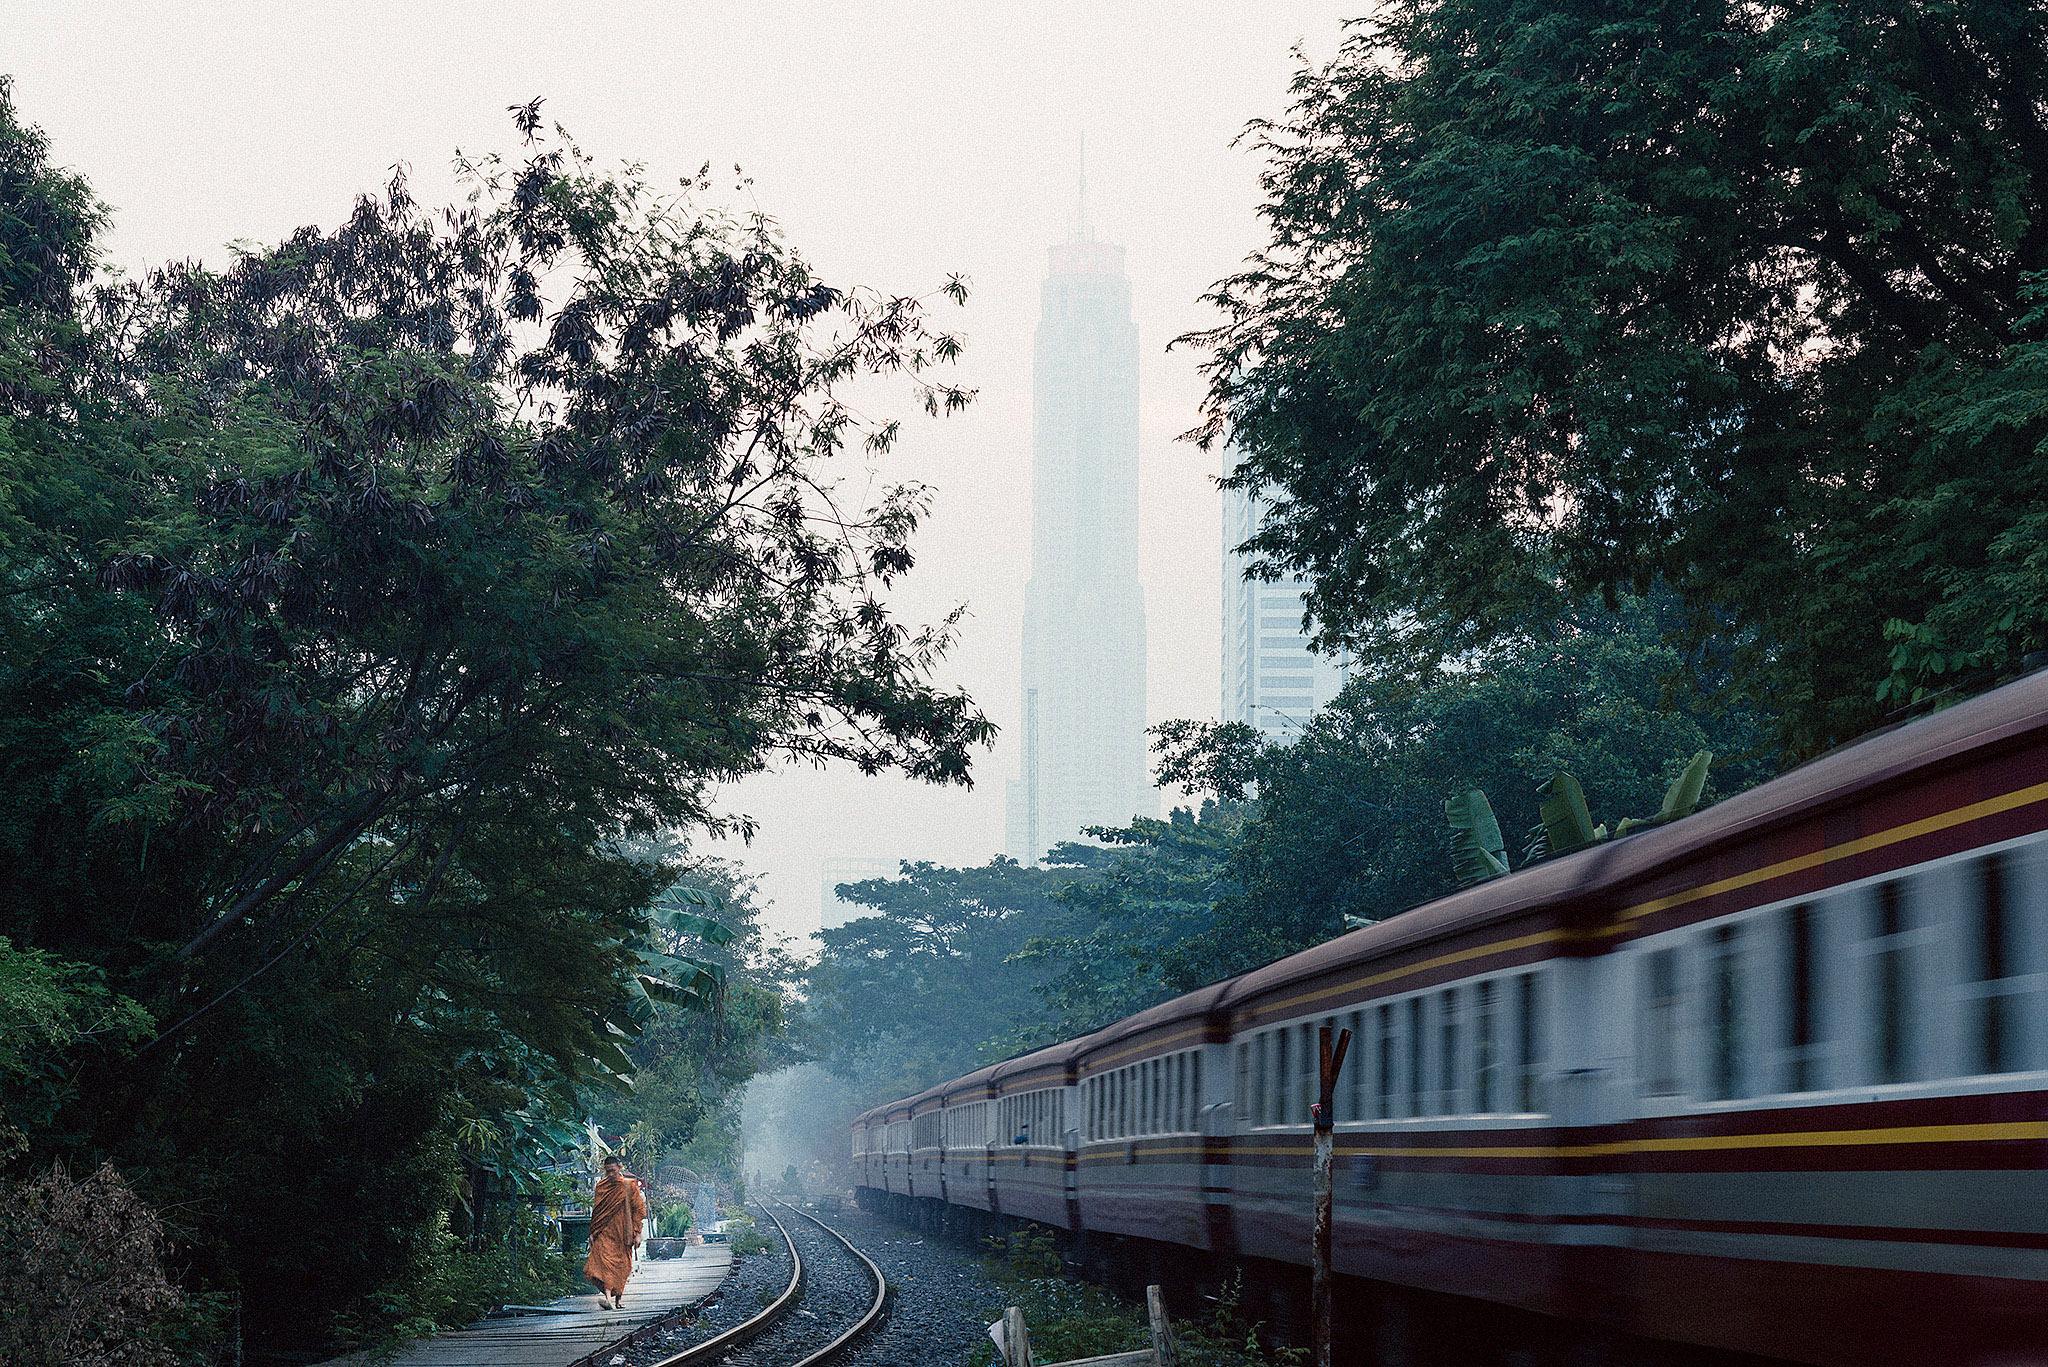 Baiyoke Tower II by Watcharin Ngamjitprapat 02.jpg